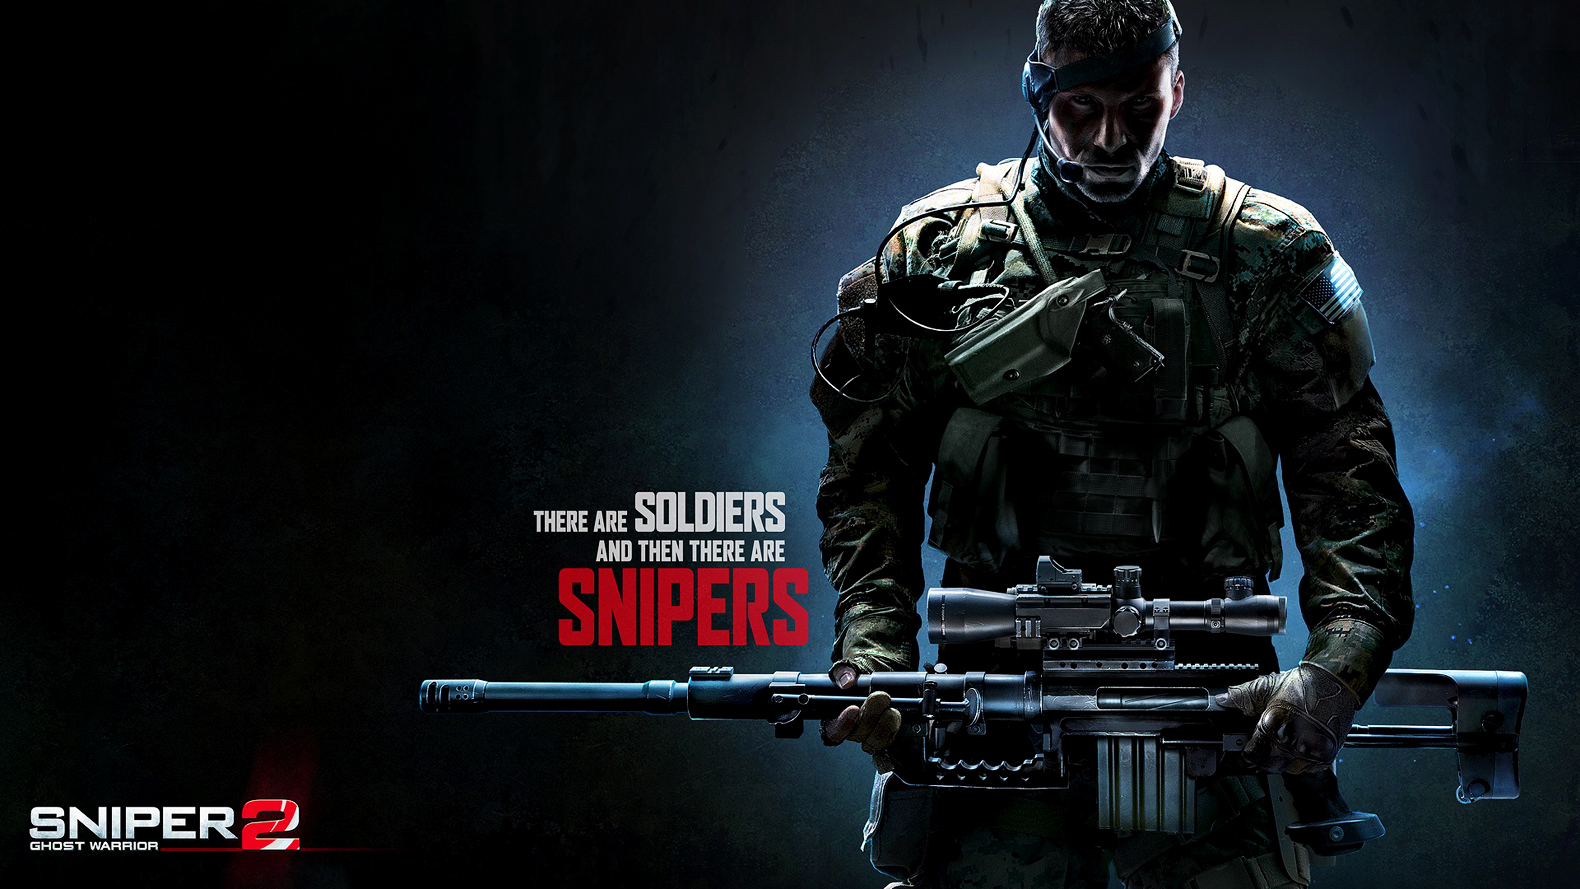 http://2.bp.blogspot.com/-K8fxG0Fxi6c/UKZ3RtPfljI/AAAAAAAAGIA/bu0zcOuPML8/s1600/Sniper-2-Ghost-Warrior-HD-Sniper-Wallpaper_Vvallpaper.Net.jpg